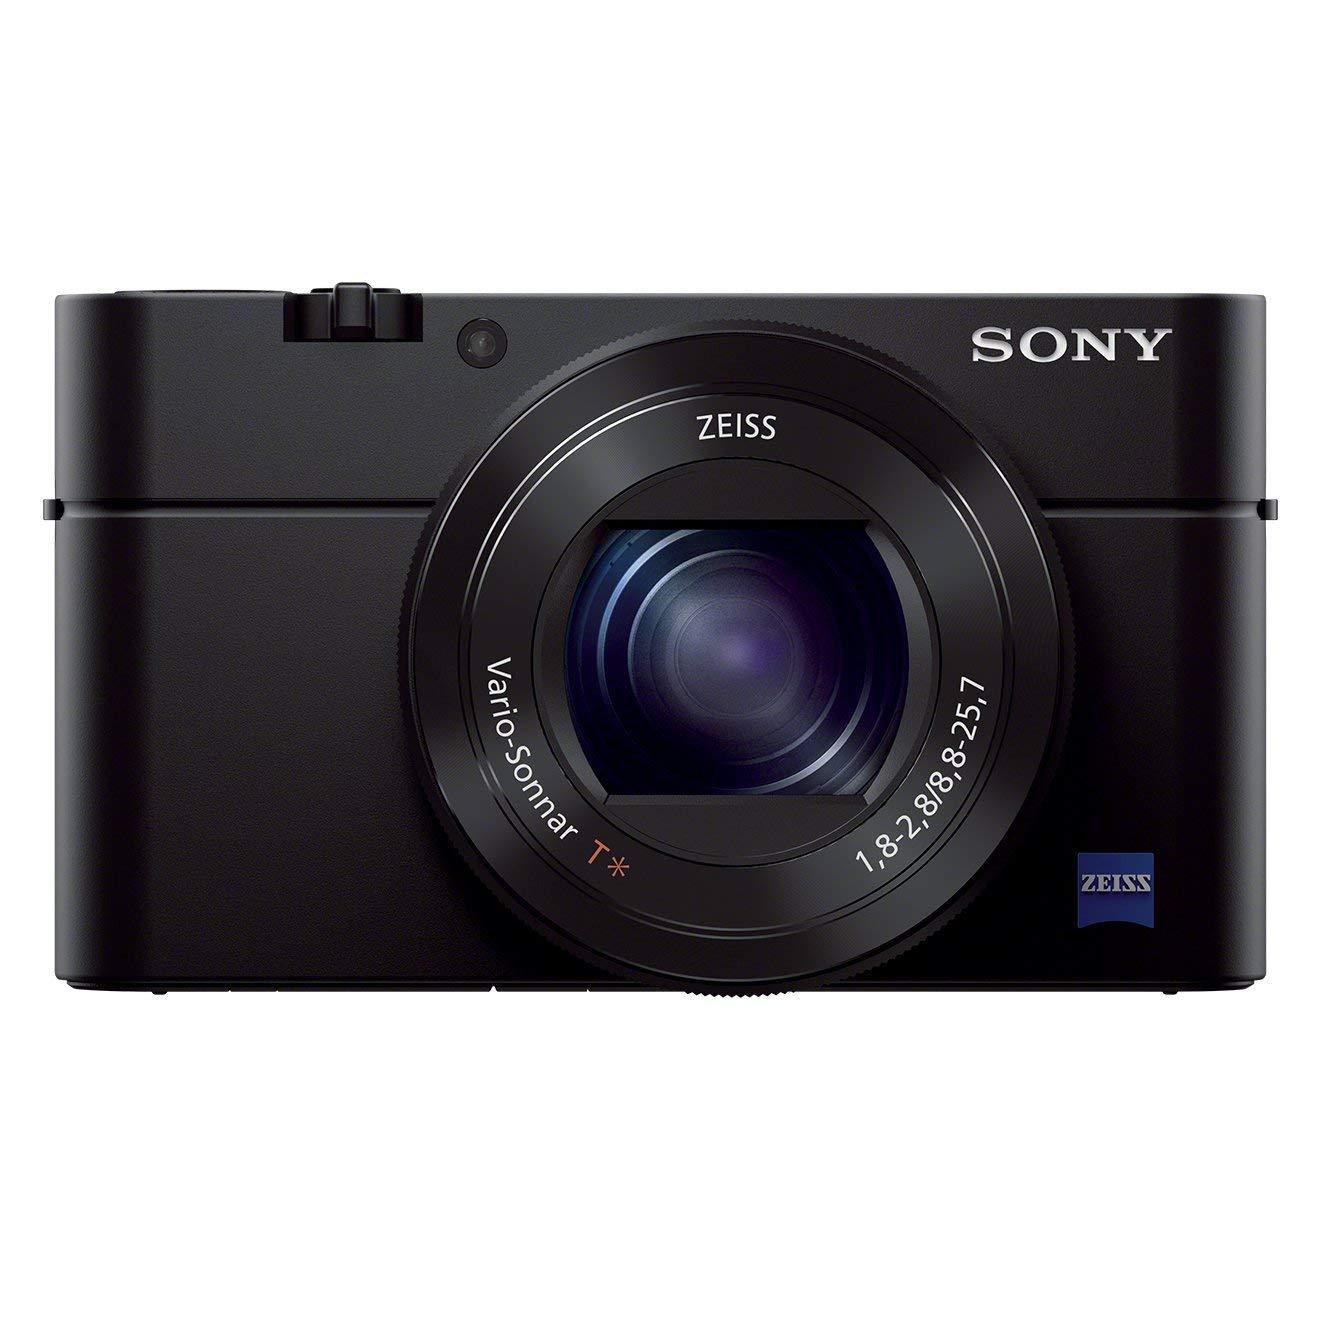 Sony RX100 M3 Advanced Compact Premium Camera - £349 (with Sony cashback) @ Amazon